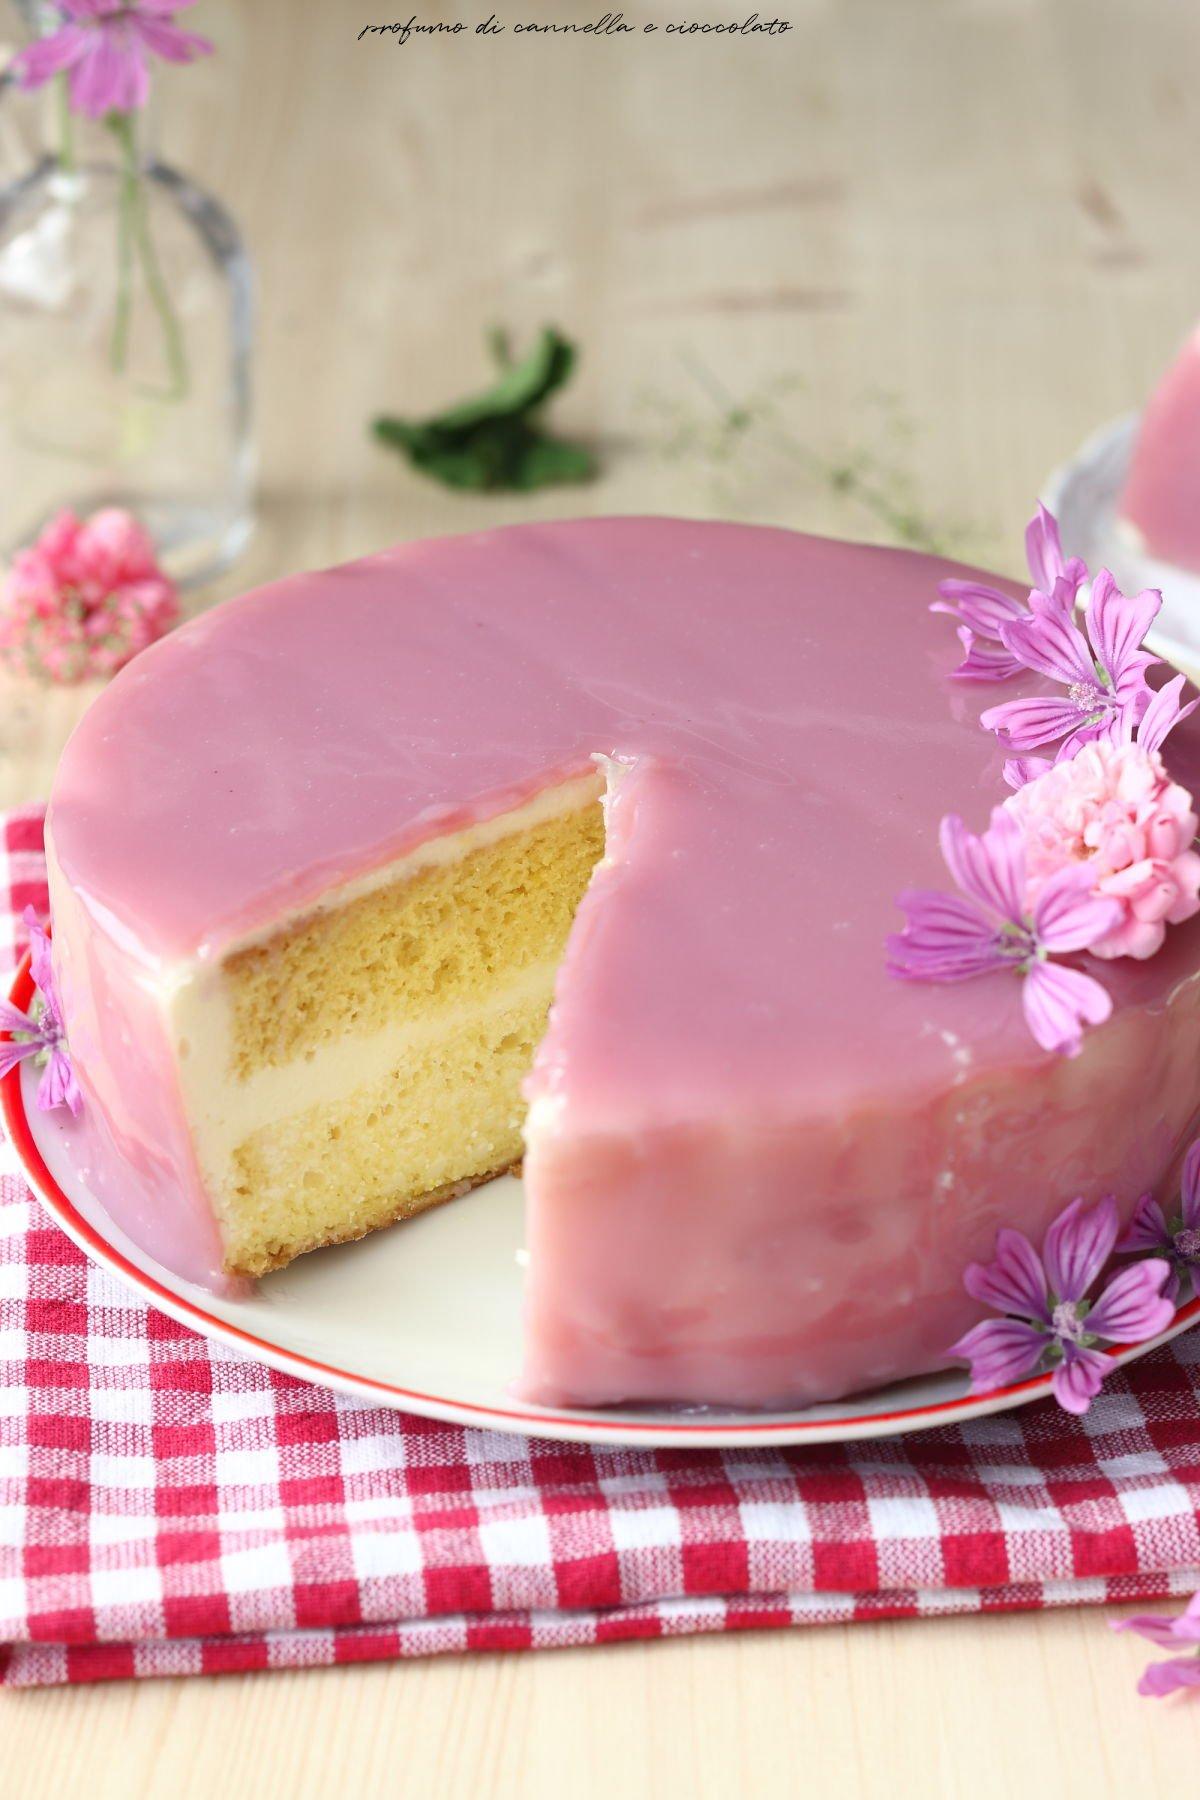 Mirror cake